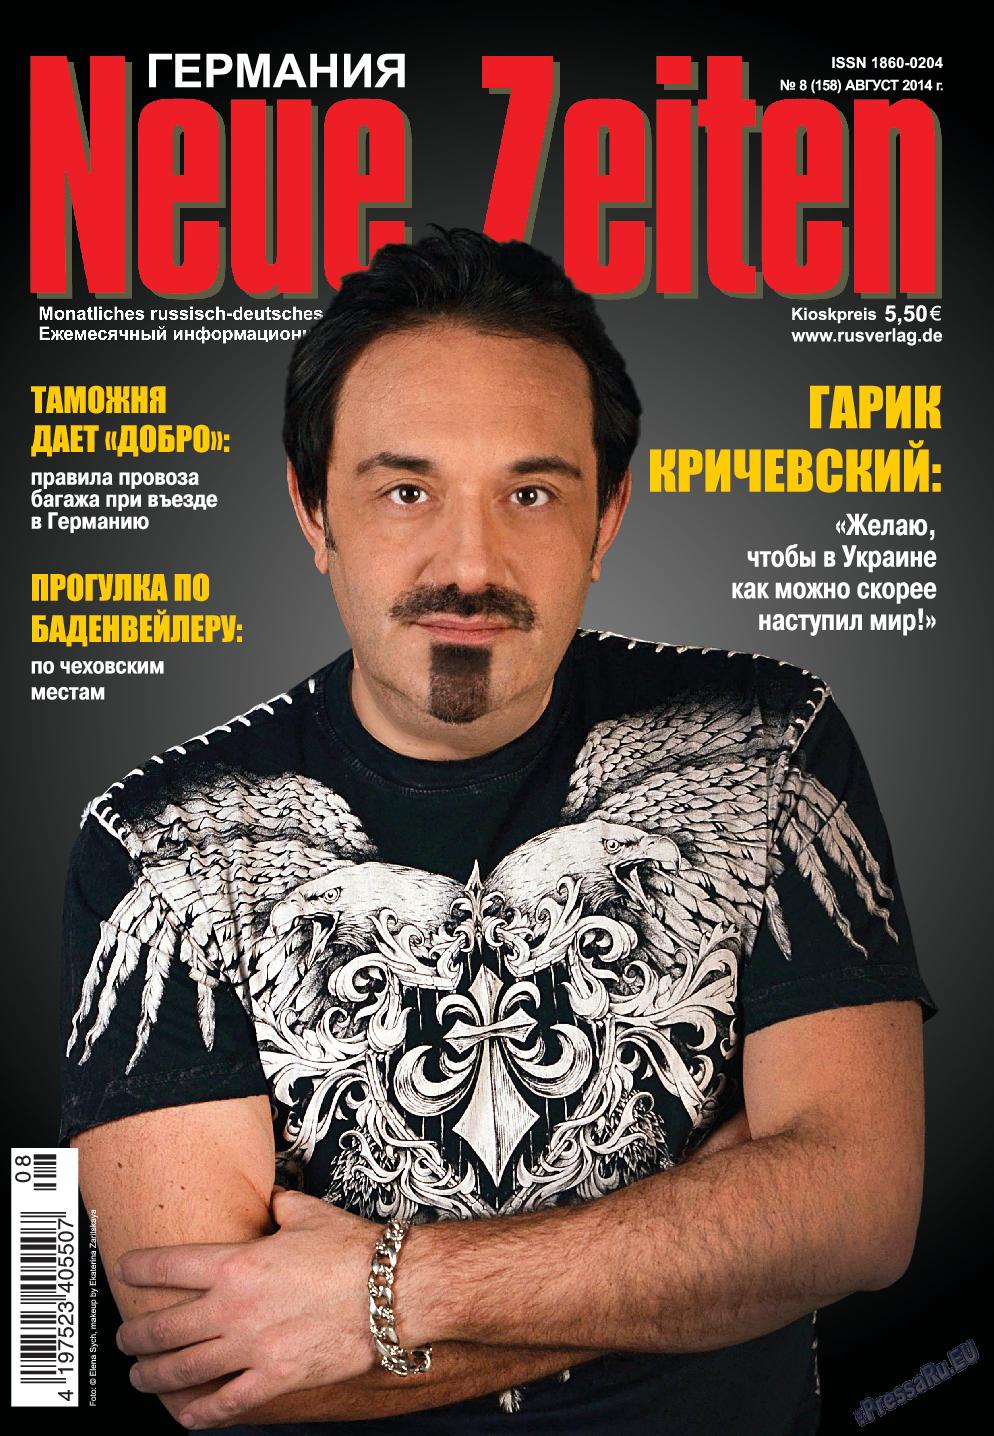 Neue Zeiten (журнал). 2014 год, номер 8, стр. 1